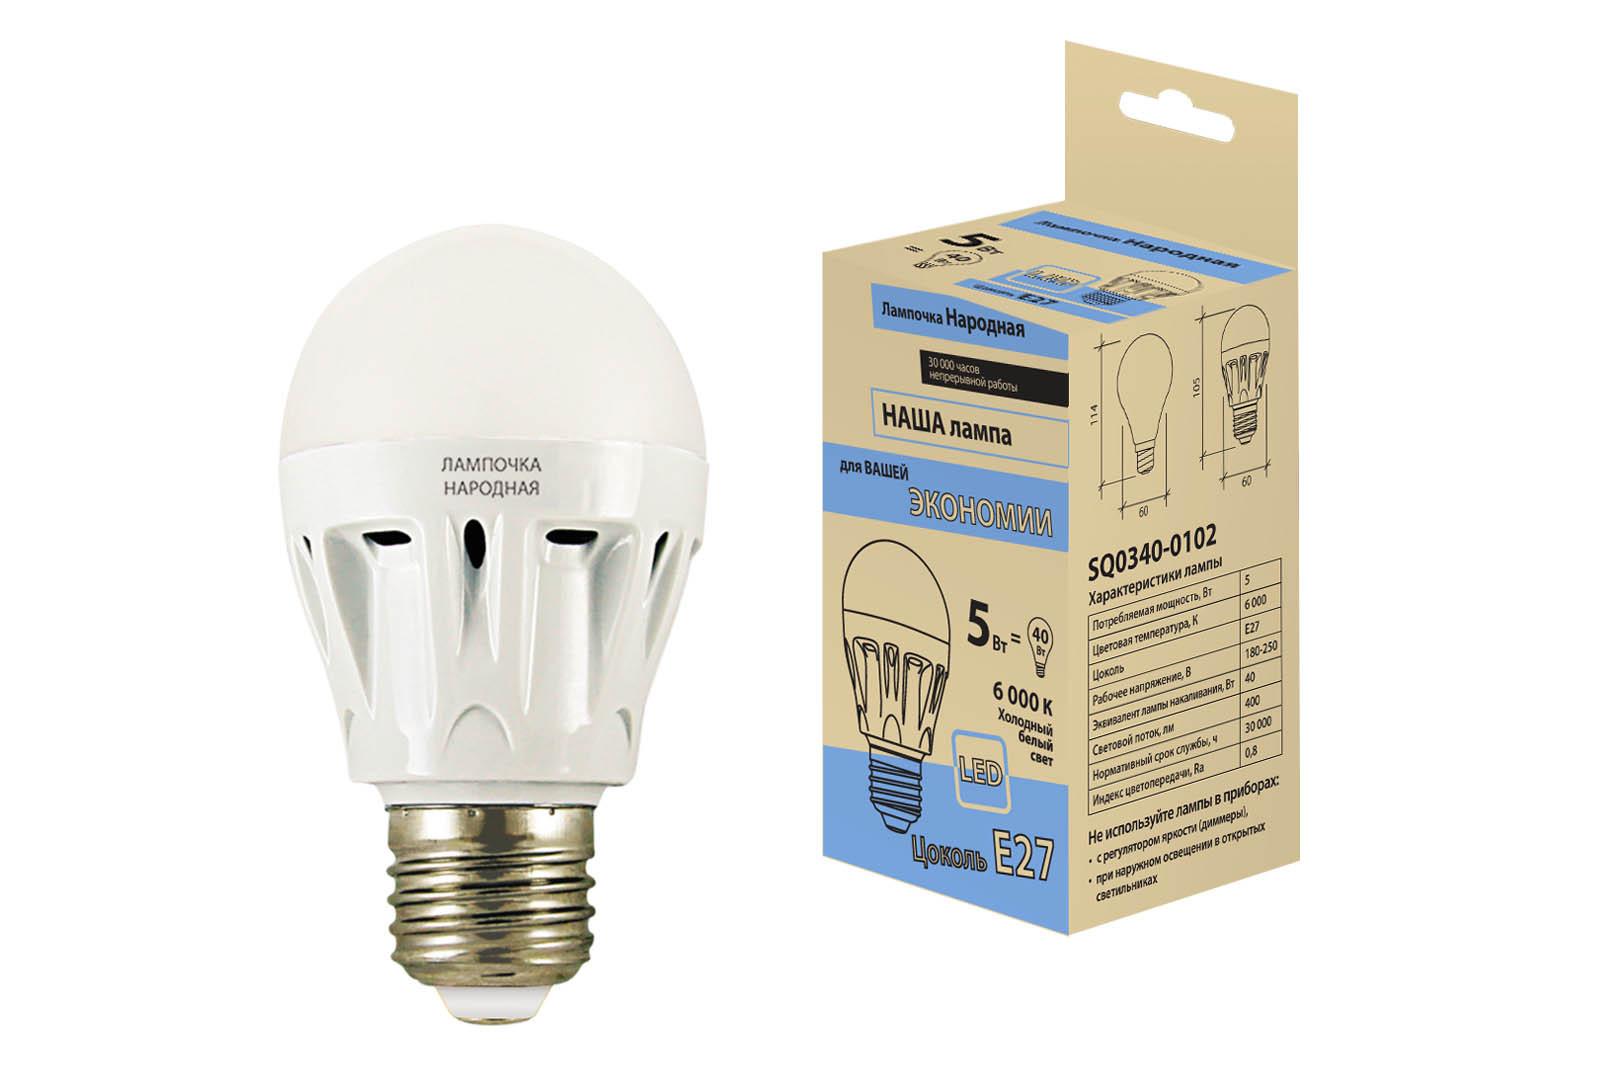 Лампа светодиодная Tdm Sq0340-0102